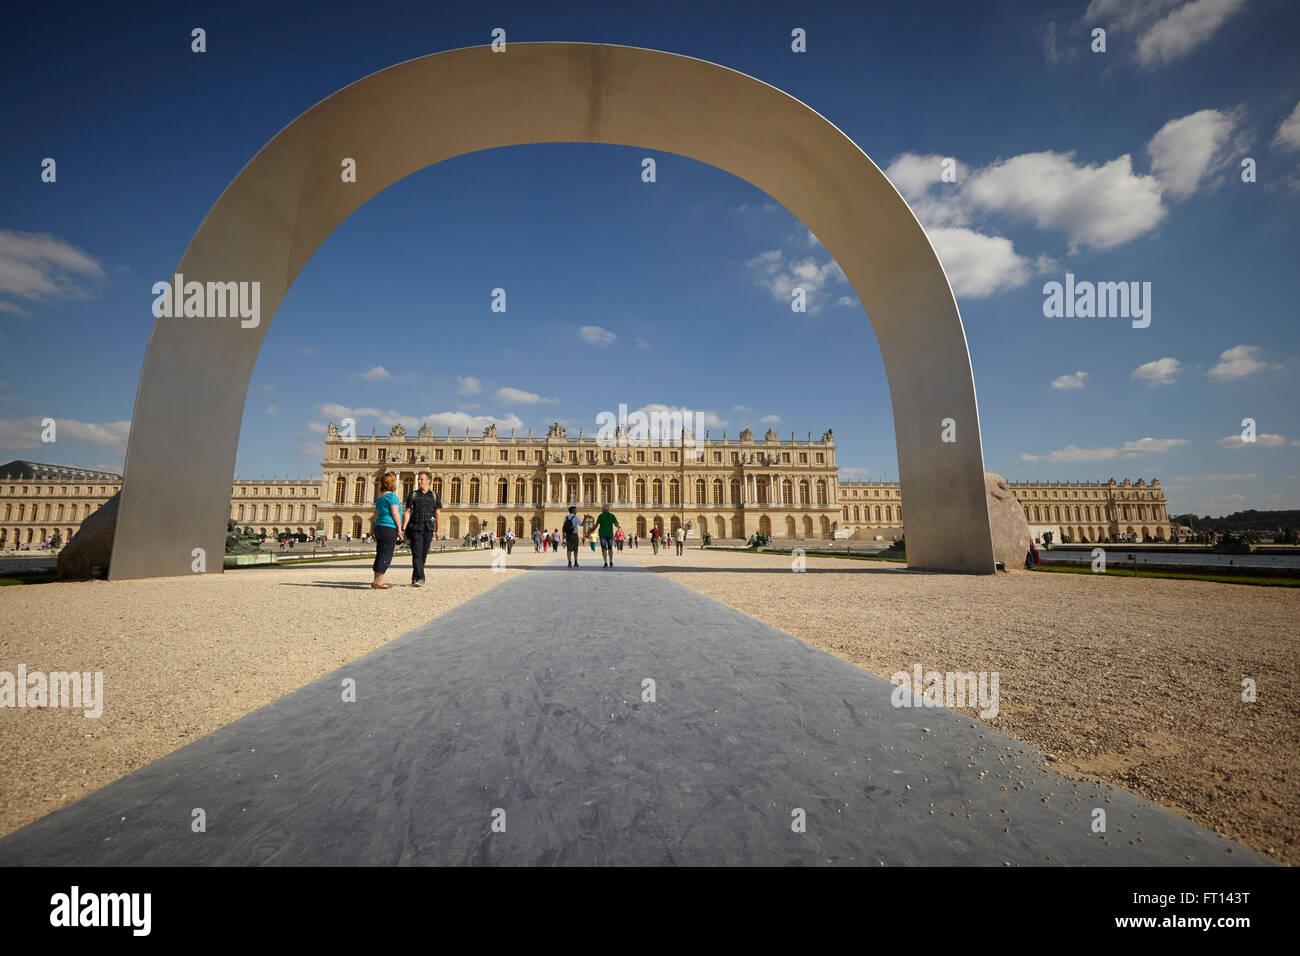 Arco, Palazzo di Versailles, Versailles vicino a Parigi, Francia Immagini Stock